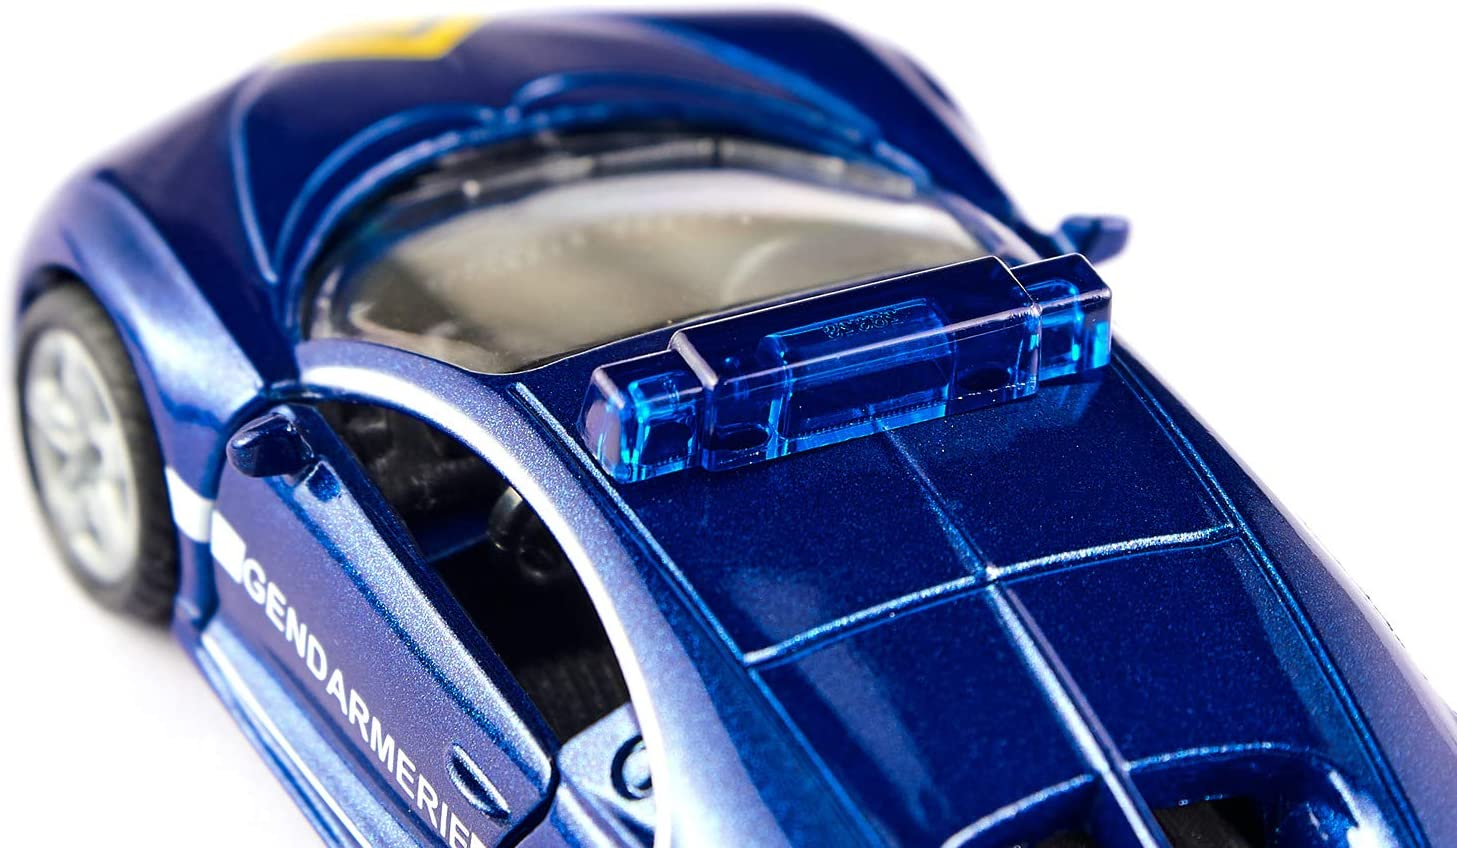 Metall//Kunststoff Bereifung aus Gummi Blau Bugatti Chiron Polizeiauto siku 1541 /Öffenbare Motorhaube